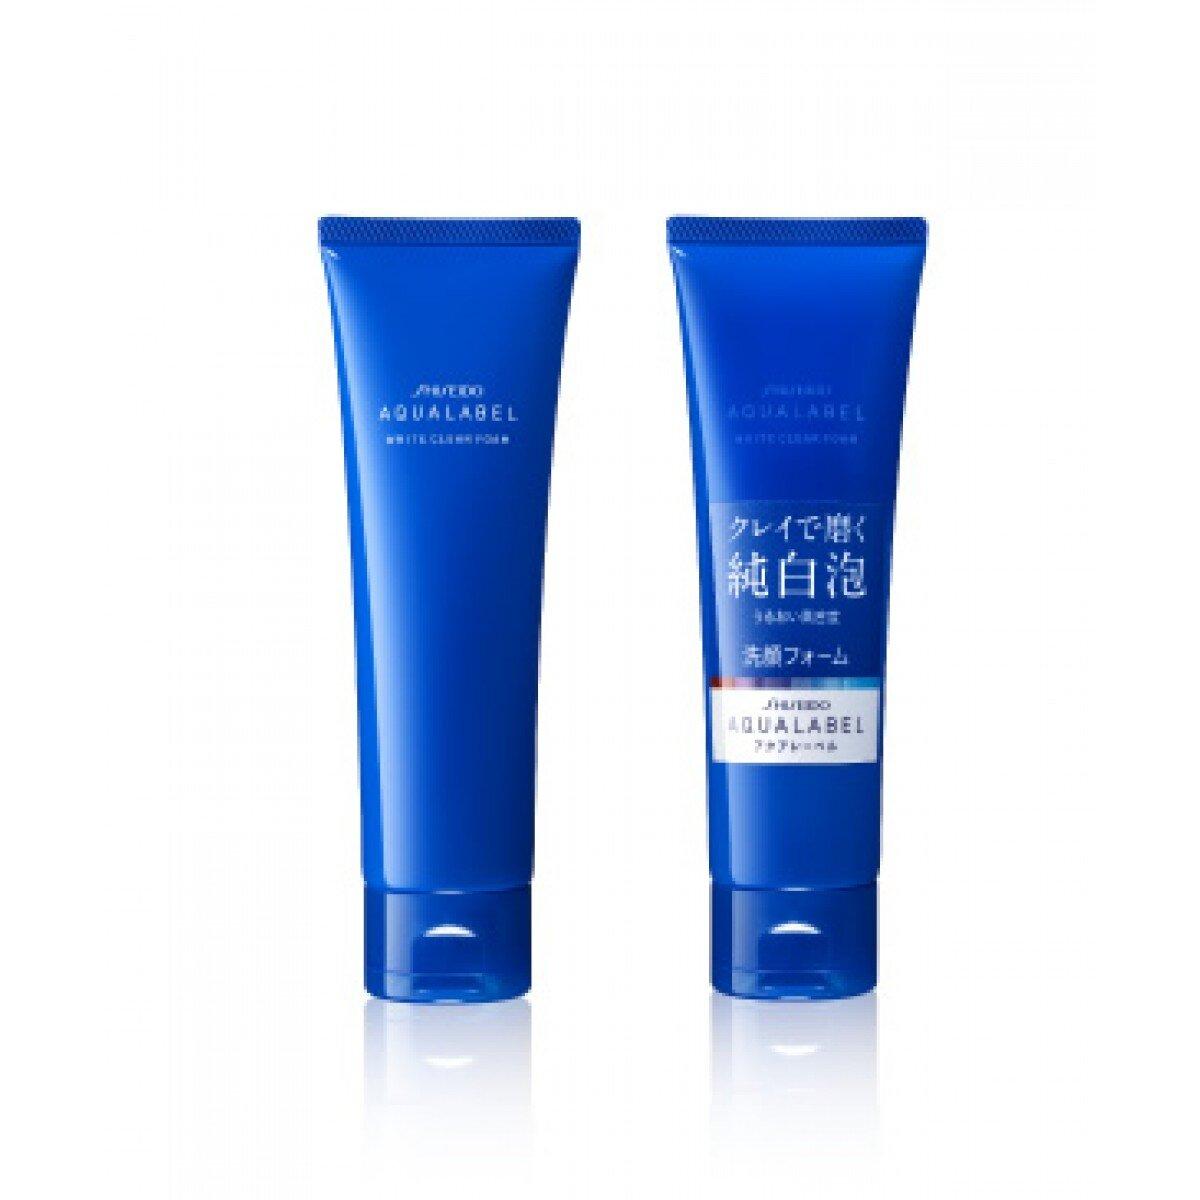 Sữa rửa mặt làm trắng da Shiseido Aqualabel White Clear Foam cho da dầu & hỗn hợp